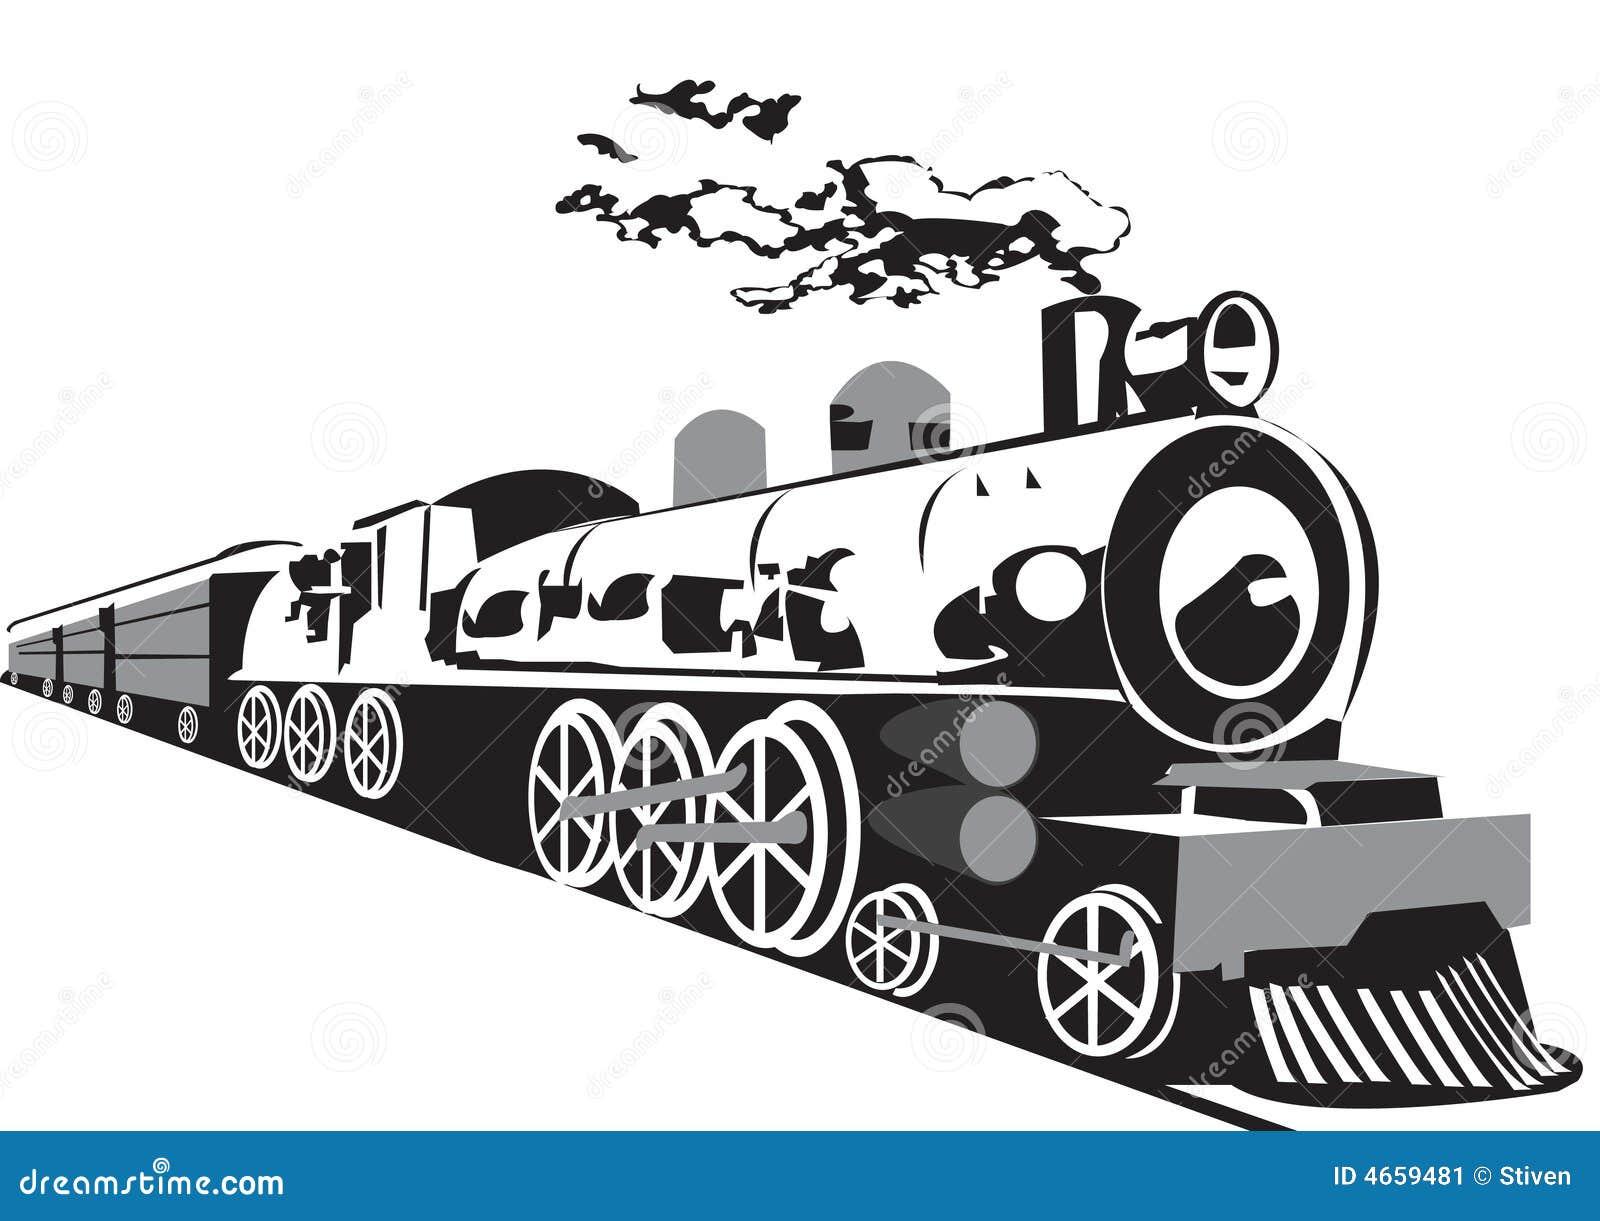 train platform clipart - photo #37